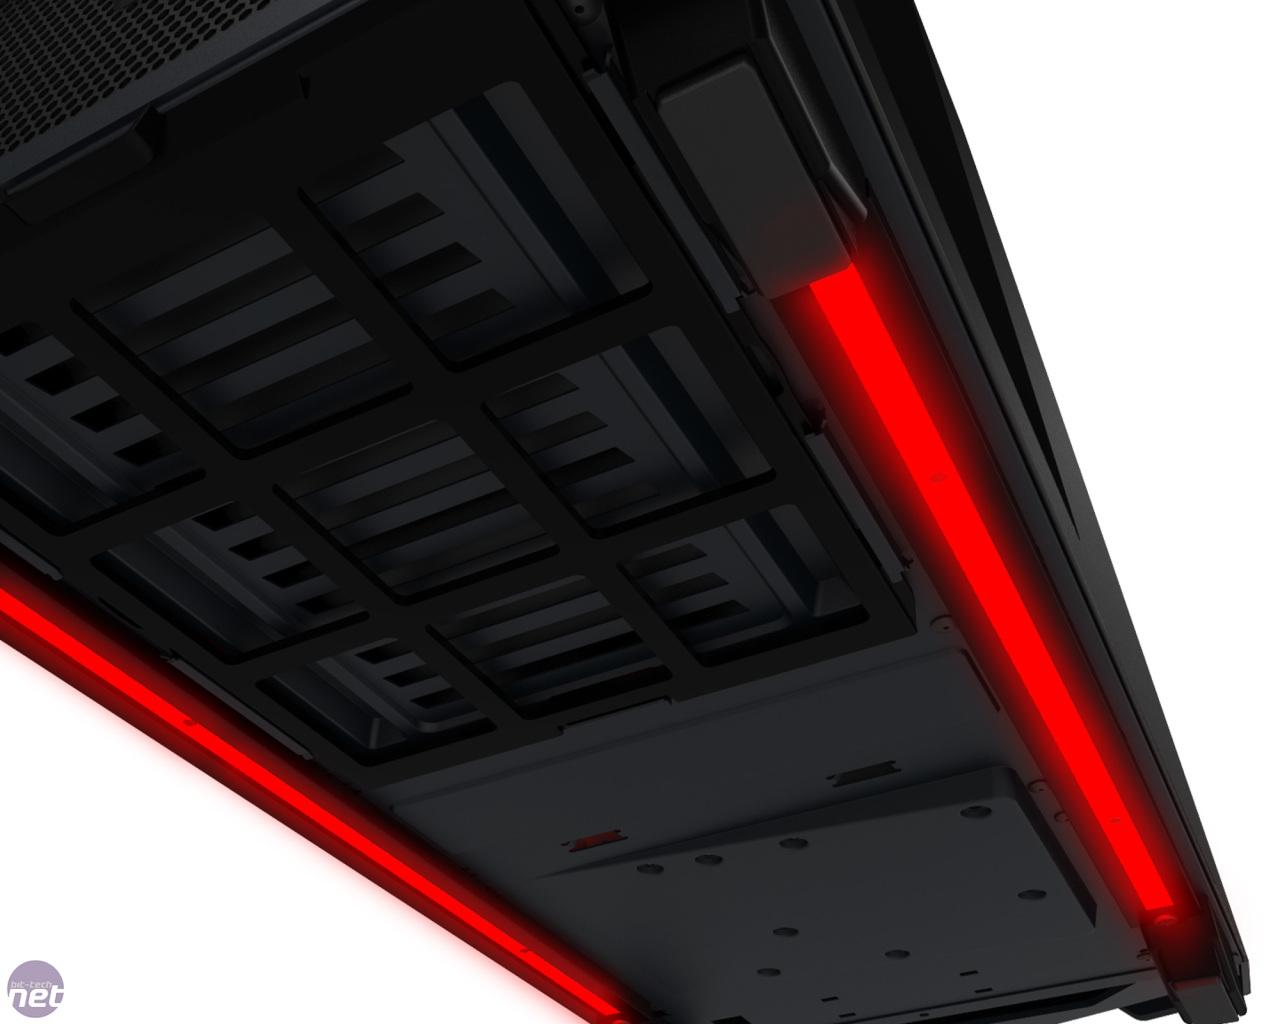 NZXT Releases Noctis 450 Mid Tower case   bit-tech net